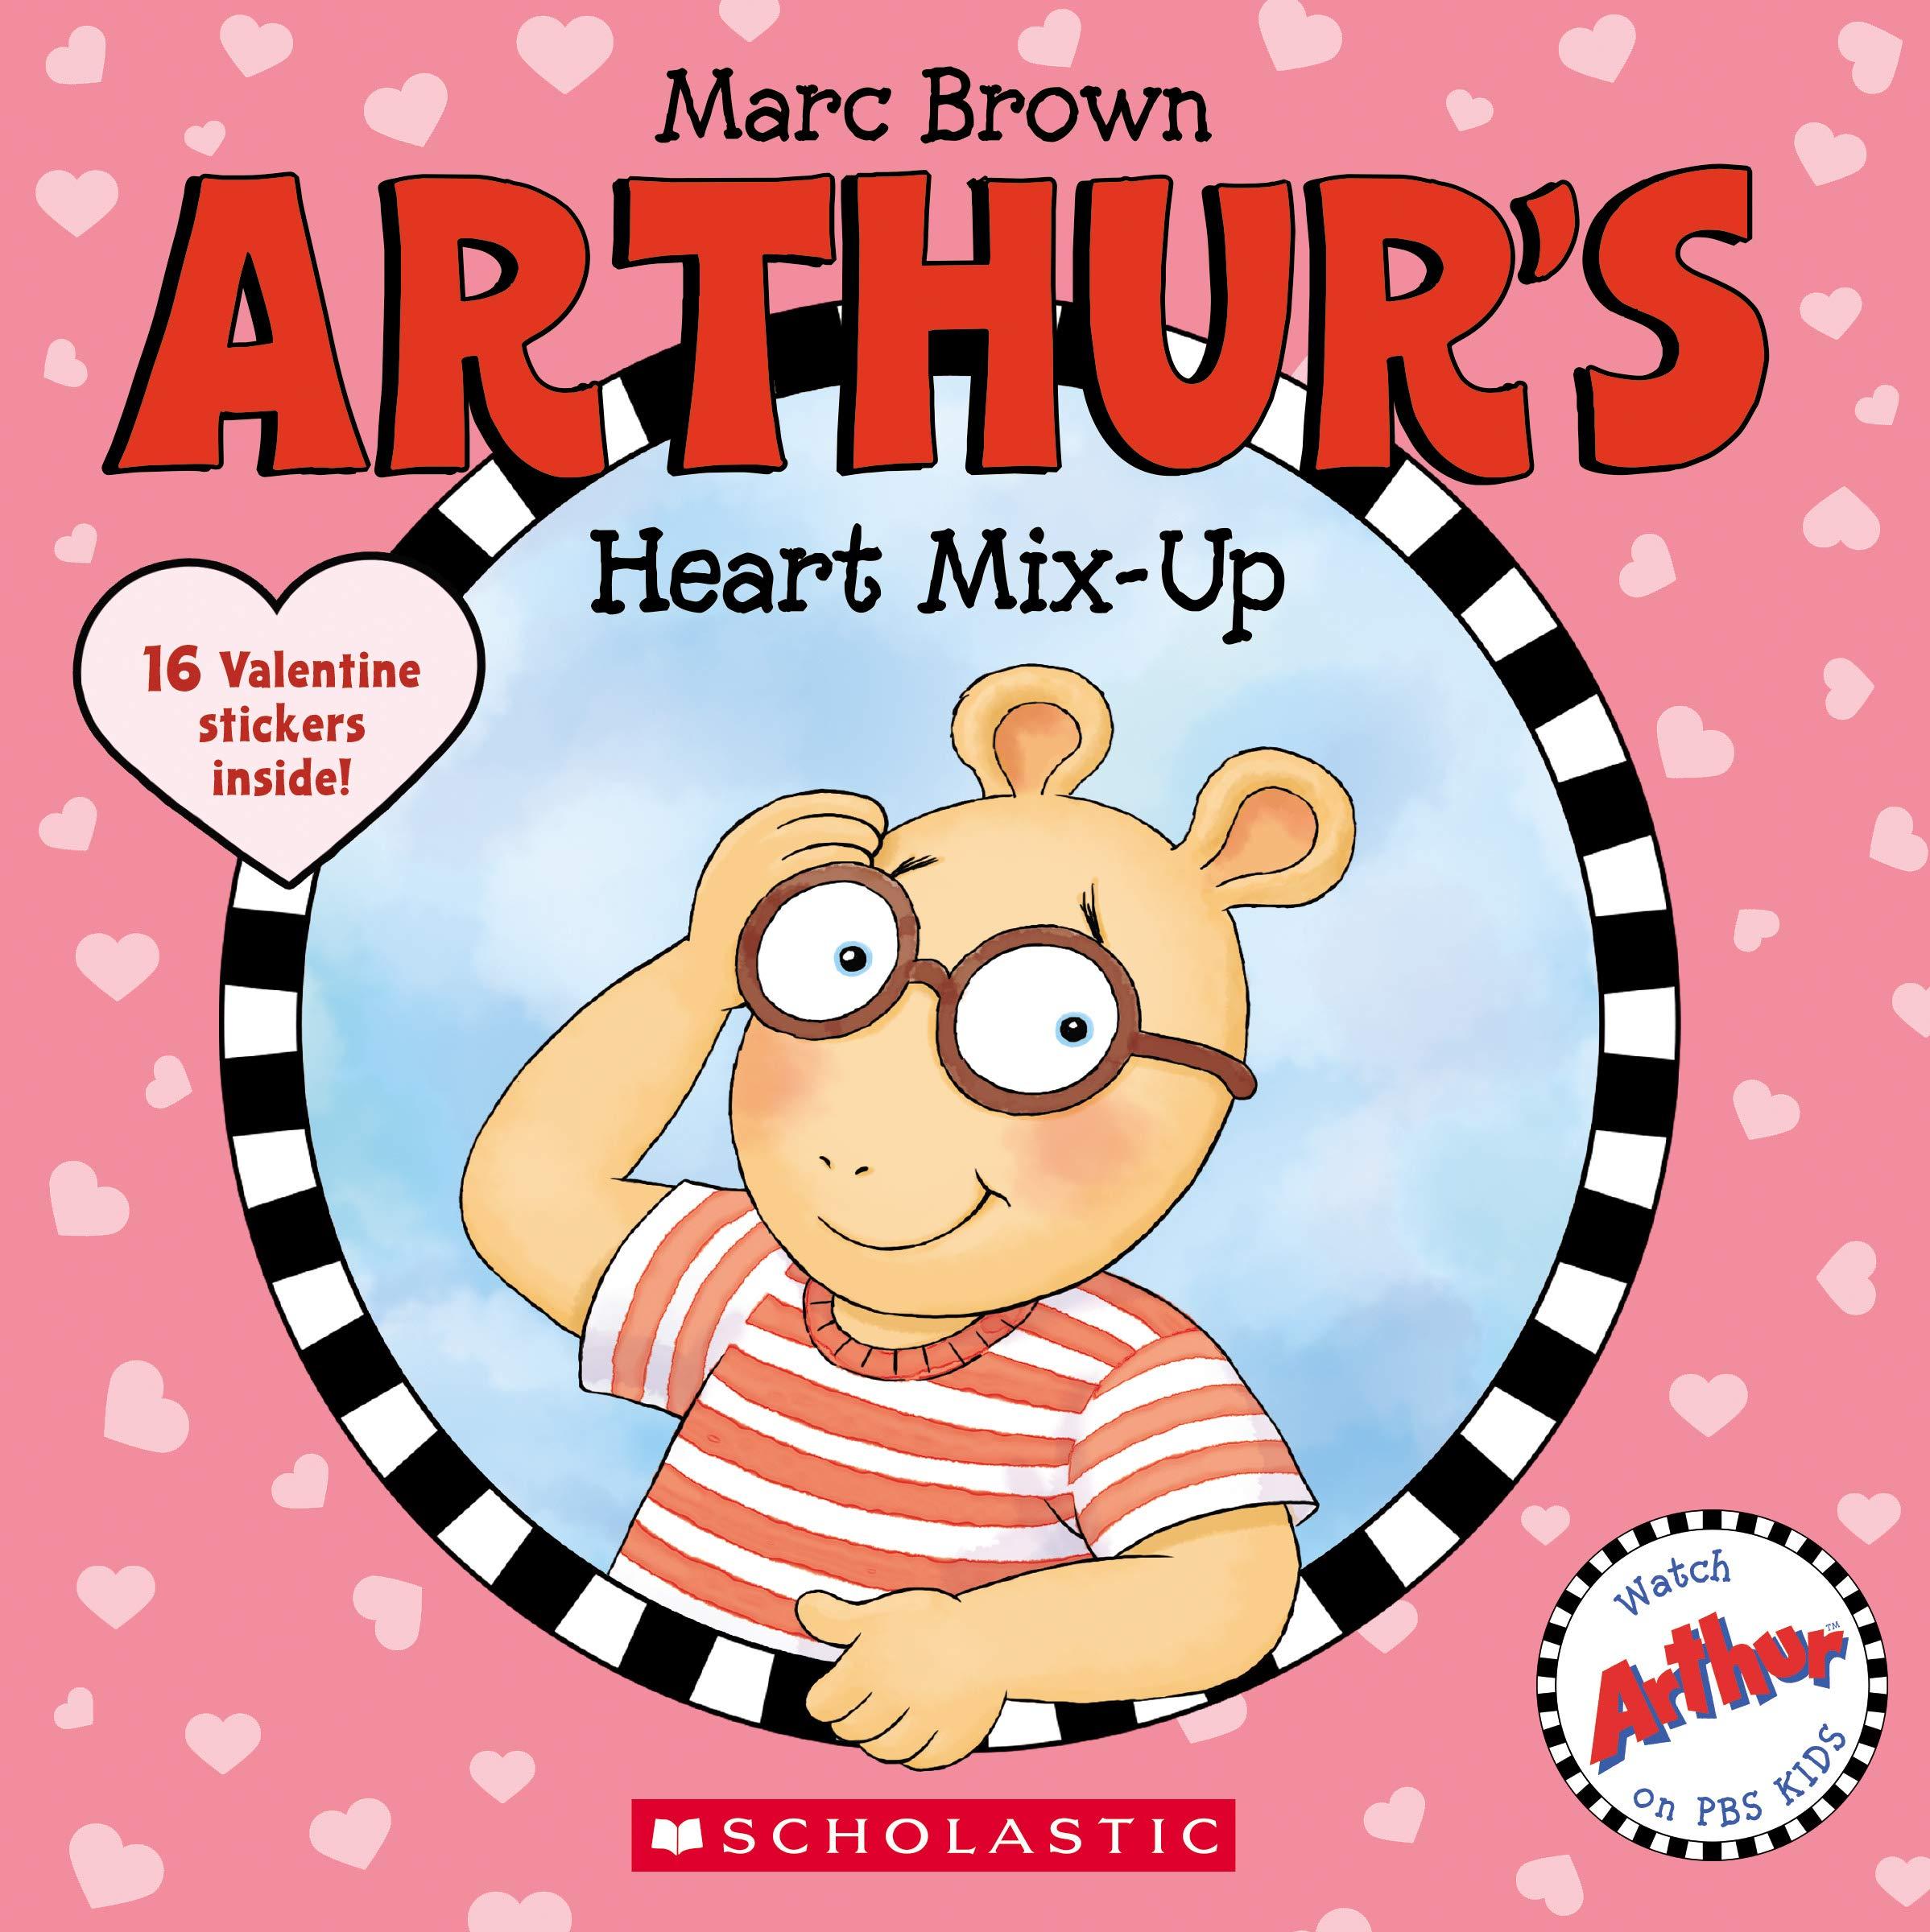 Arthur's Heart Mix-Up